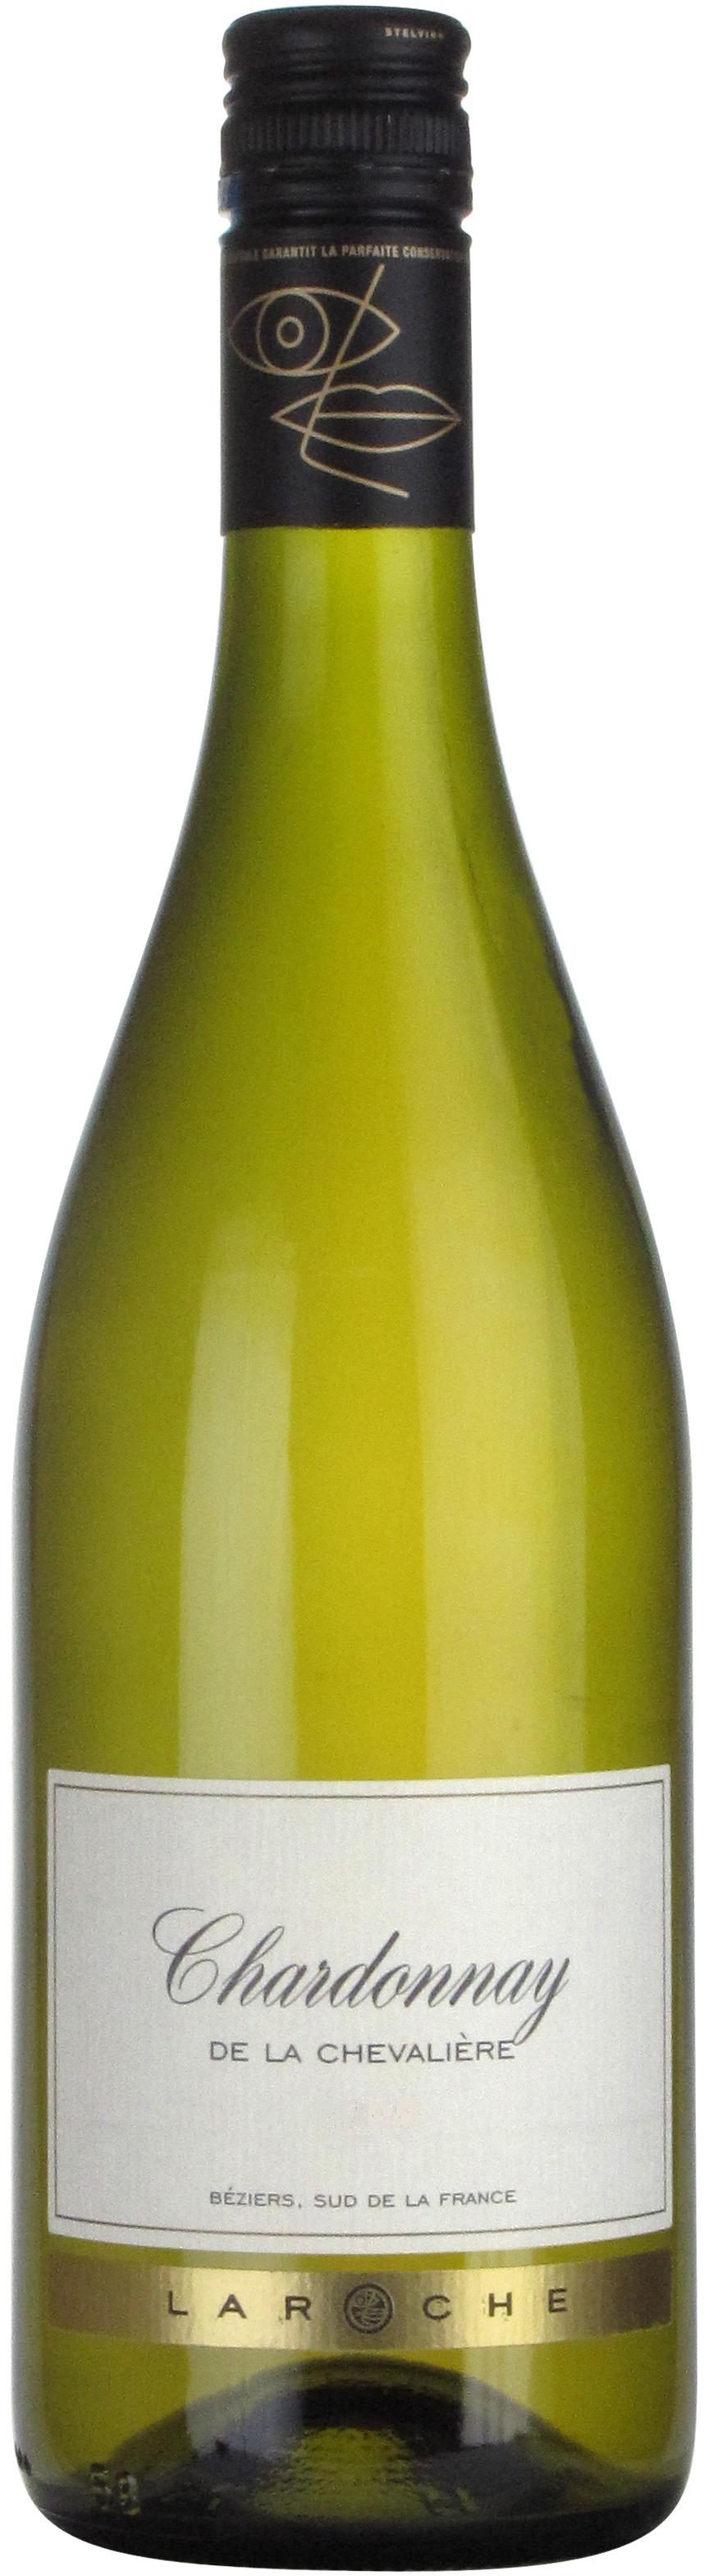 Mas La Chevalière, Chardonnay de La Chevalière 2016